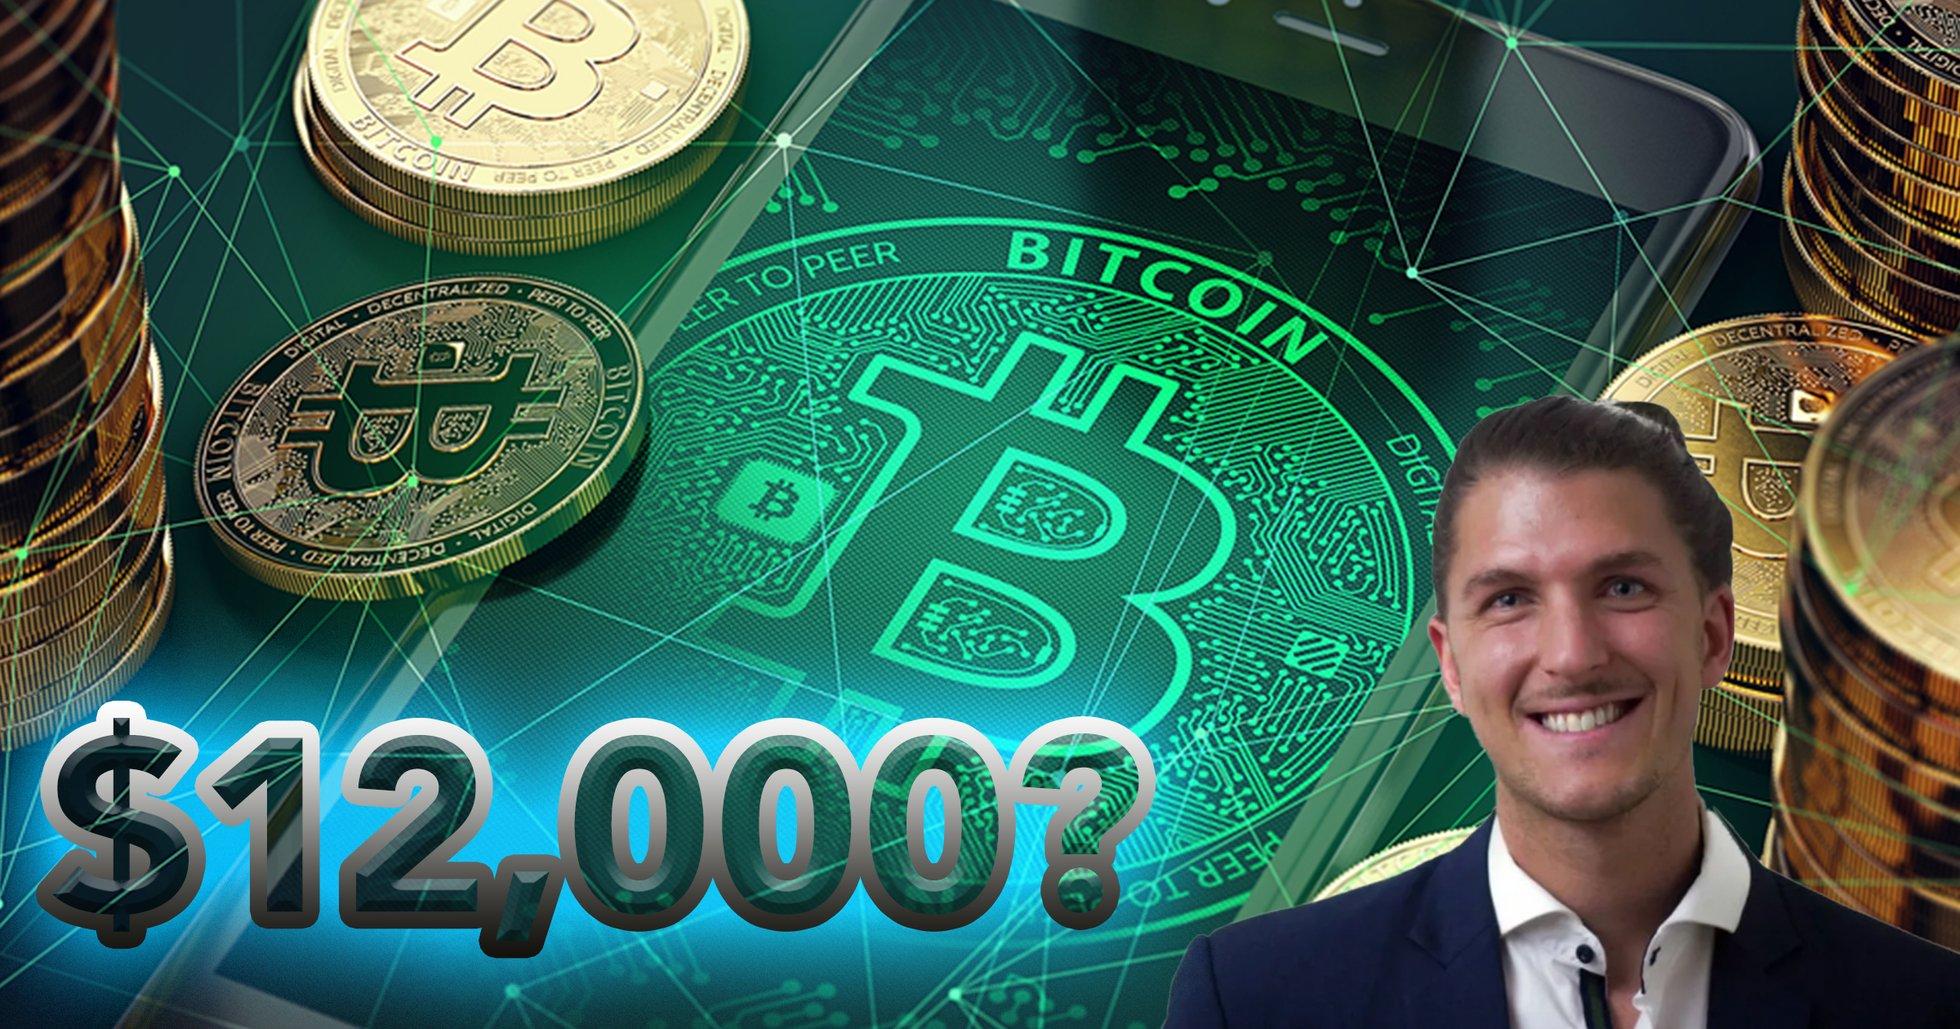 Analys: Bitcoinpriset rusar uppåt – nu kan kryptovalutan testa 12 000 dollar